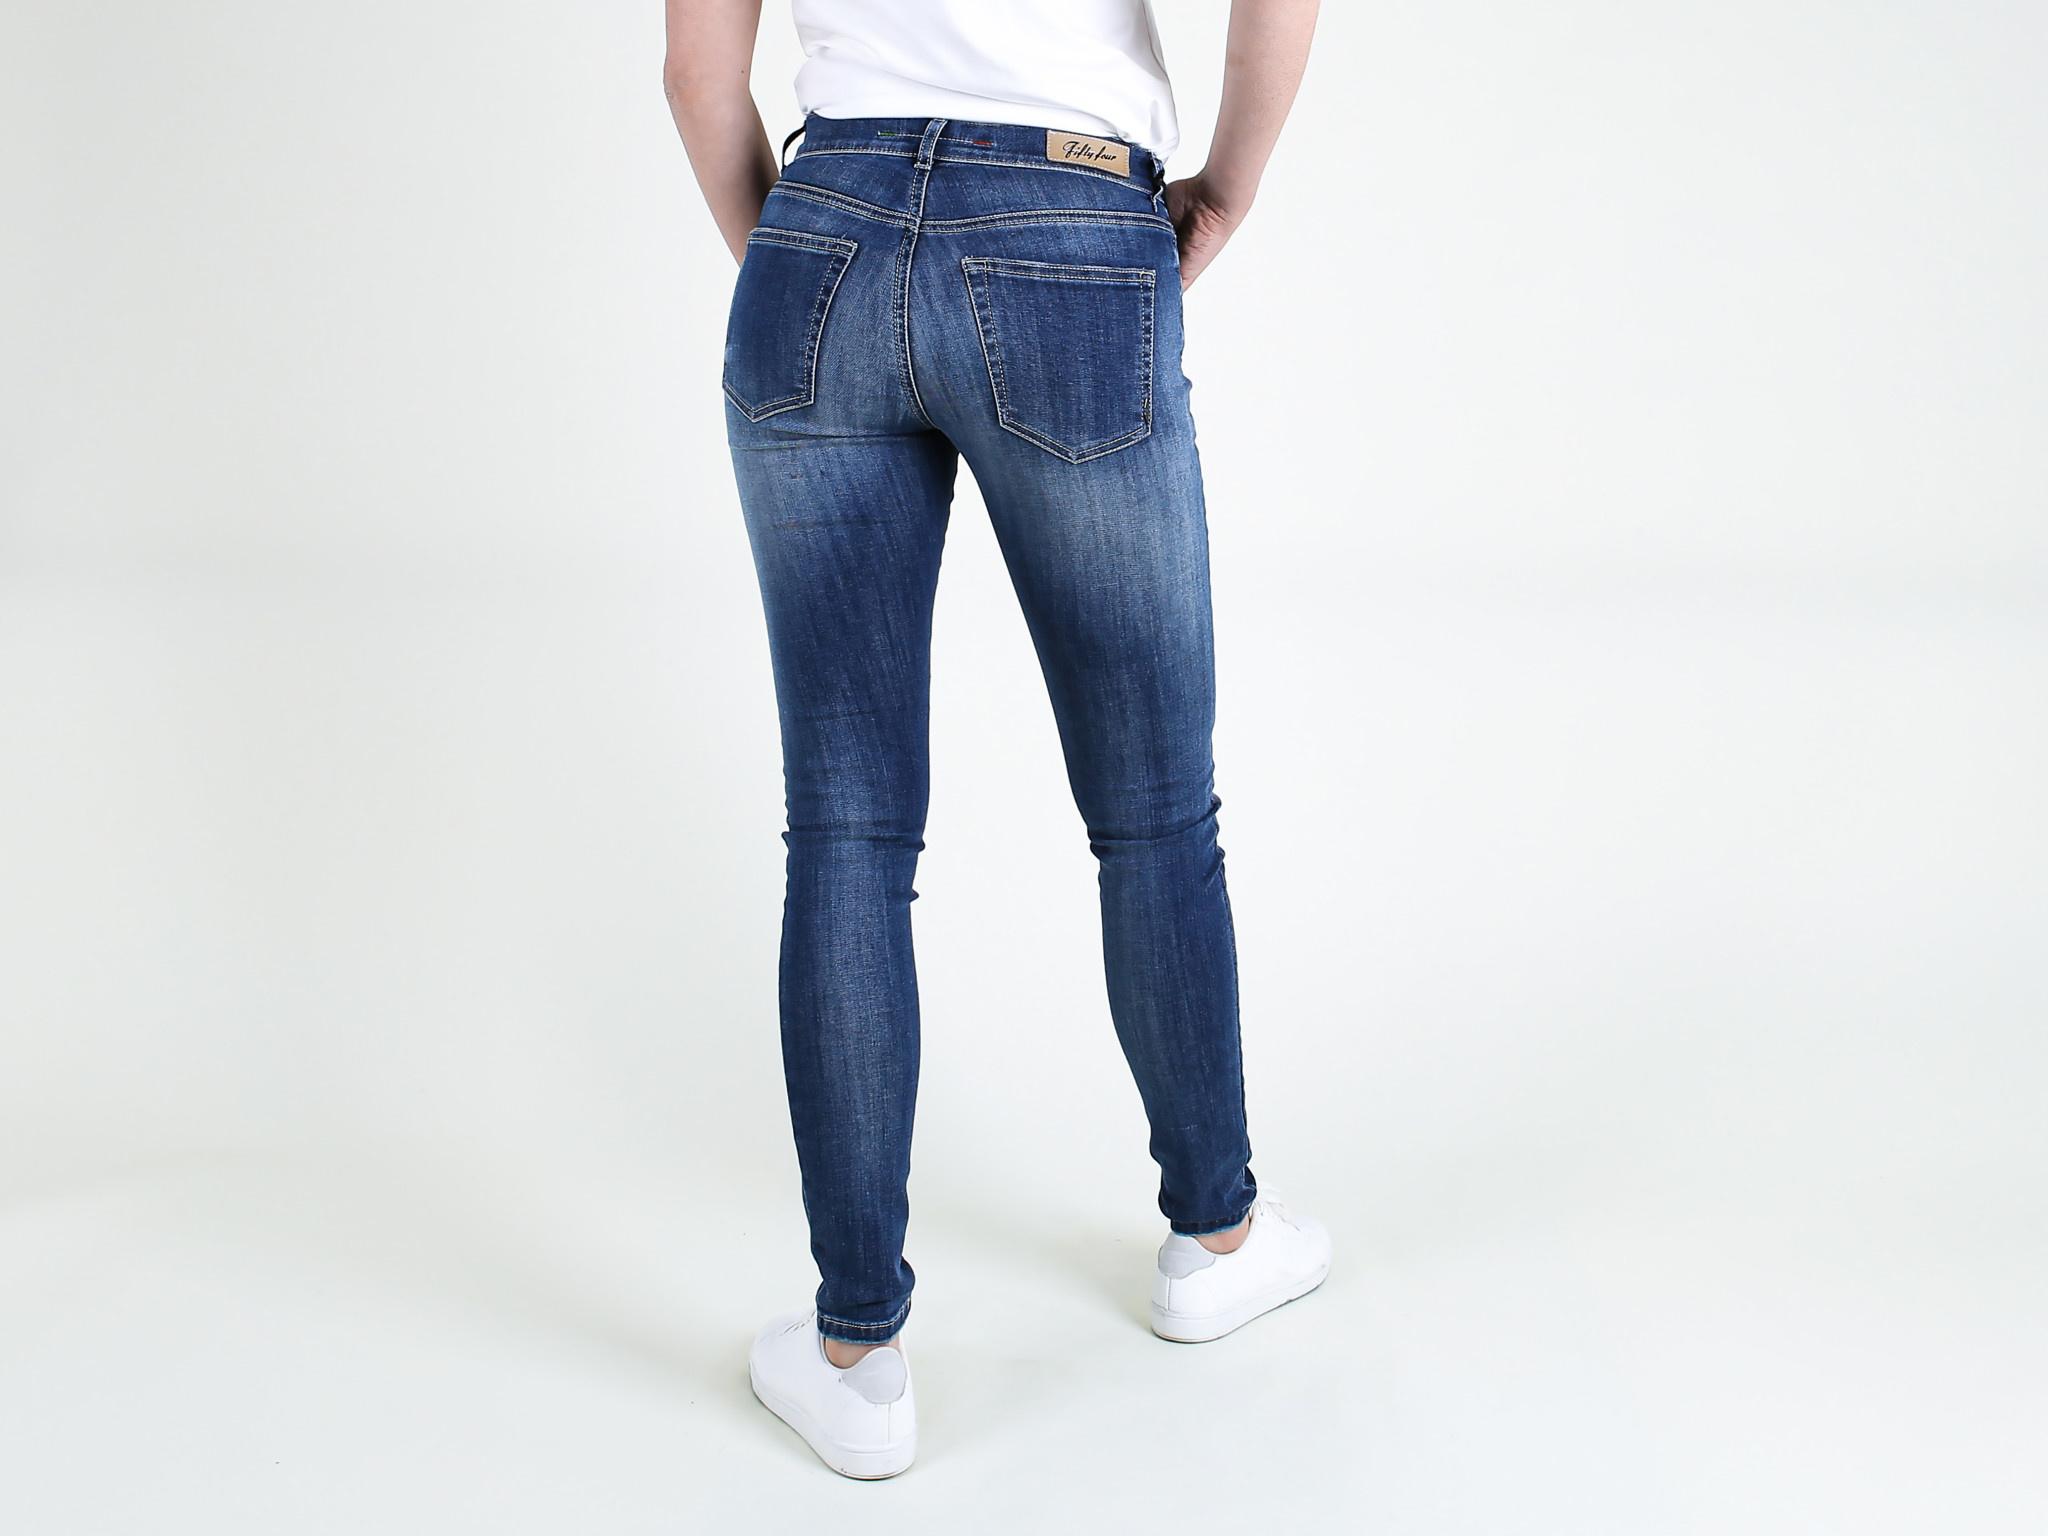 Fifty Four Fifty Four Sixty JD81 T-108-MARL Skinny Jeans Stone Wahed Blue